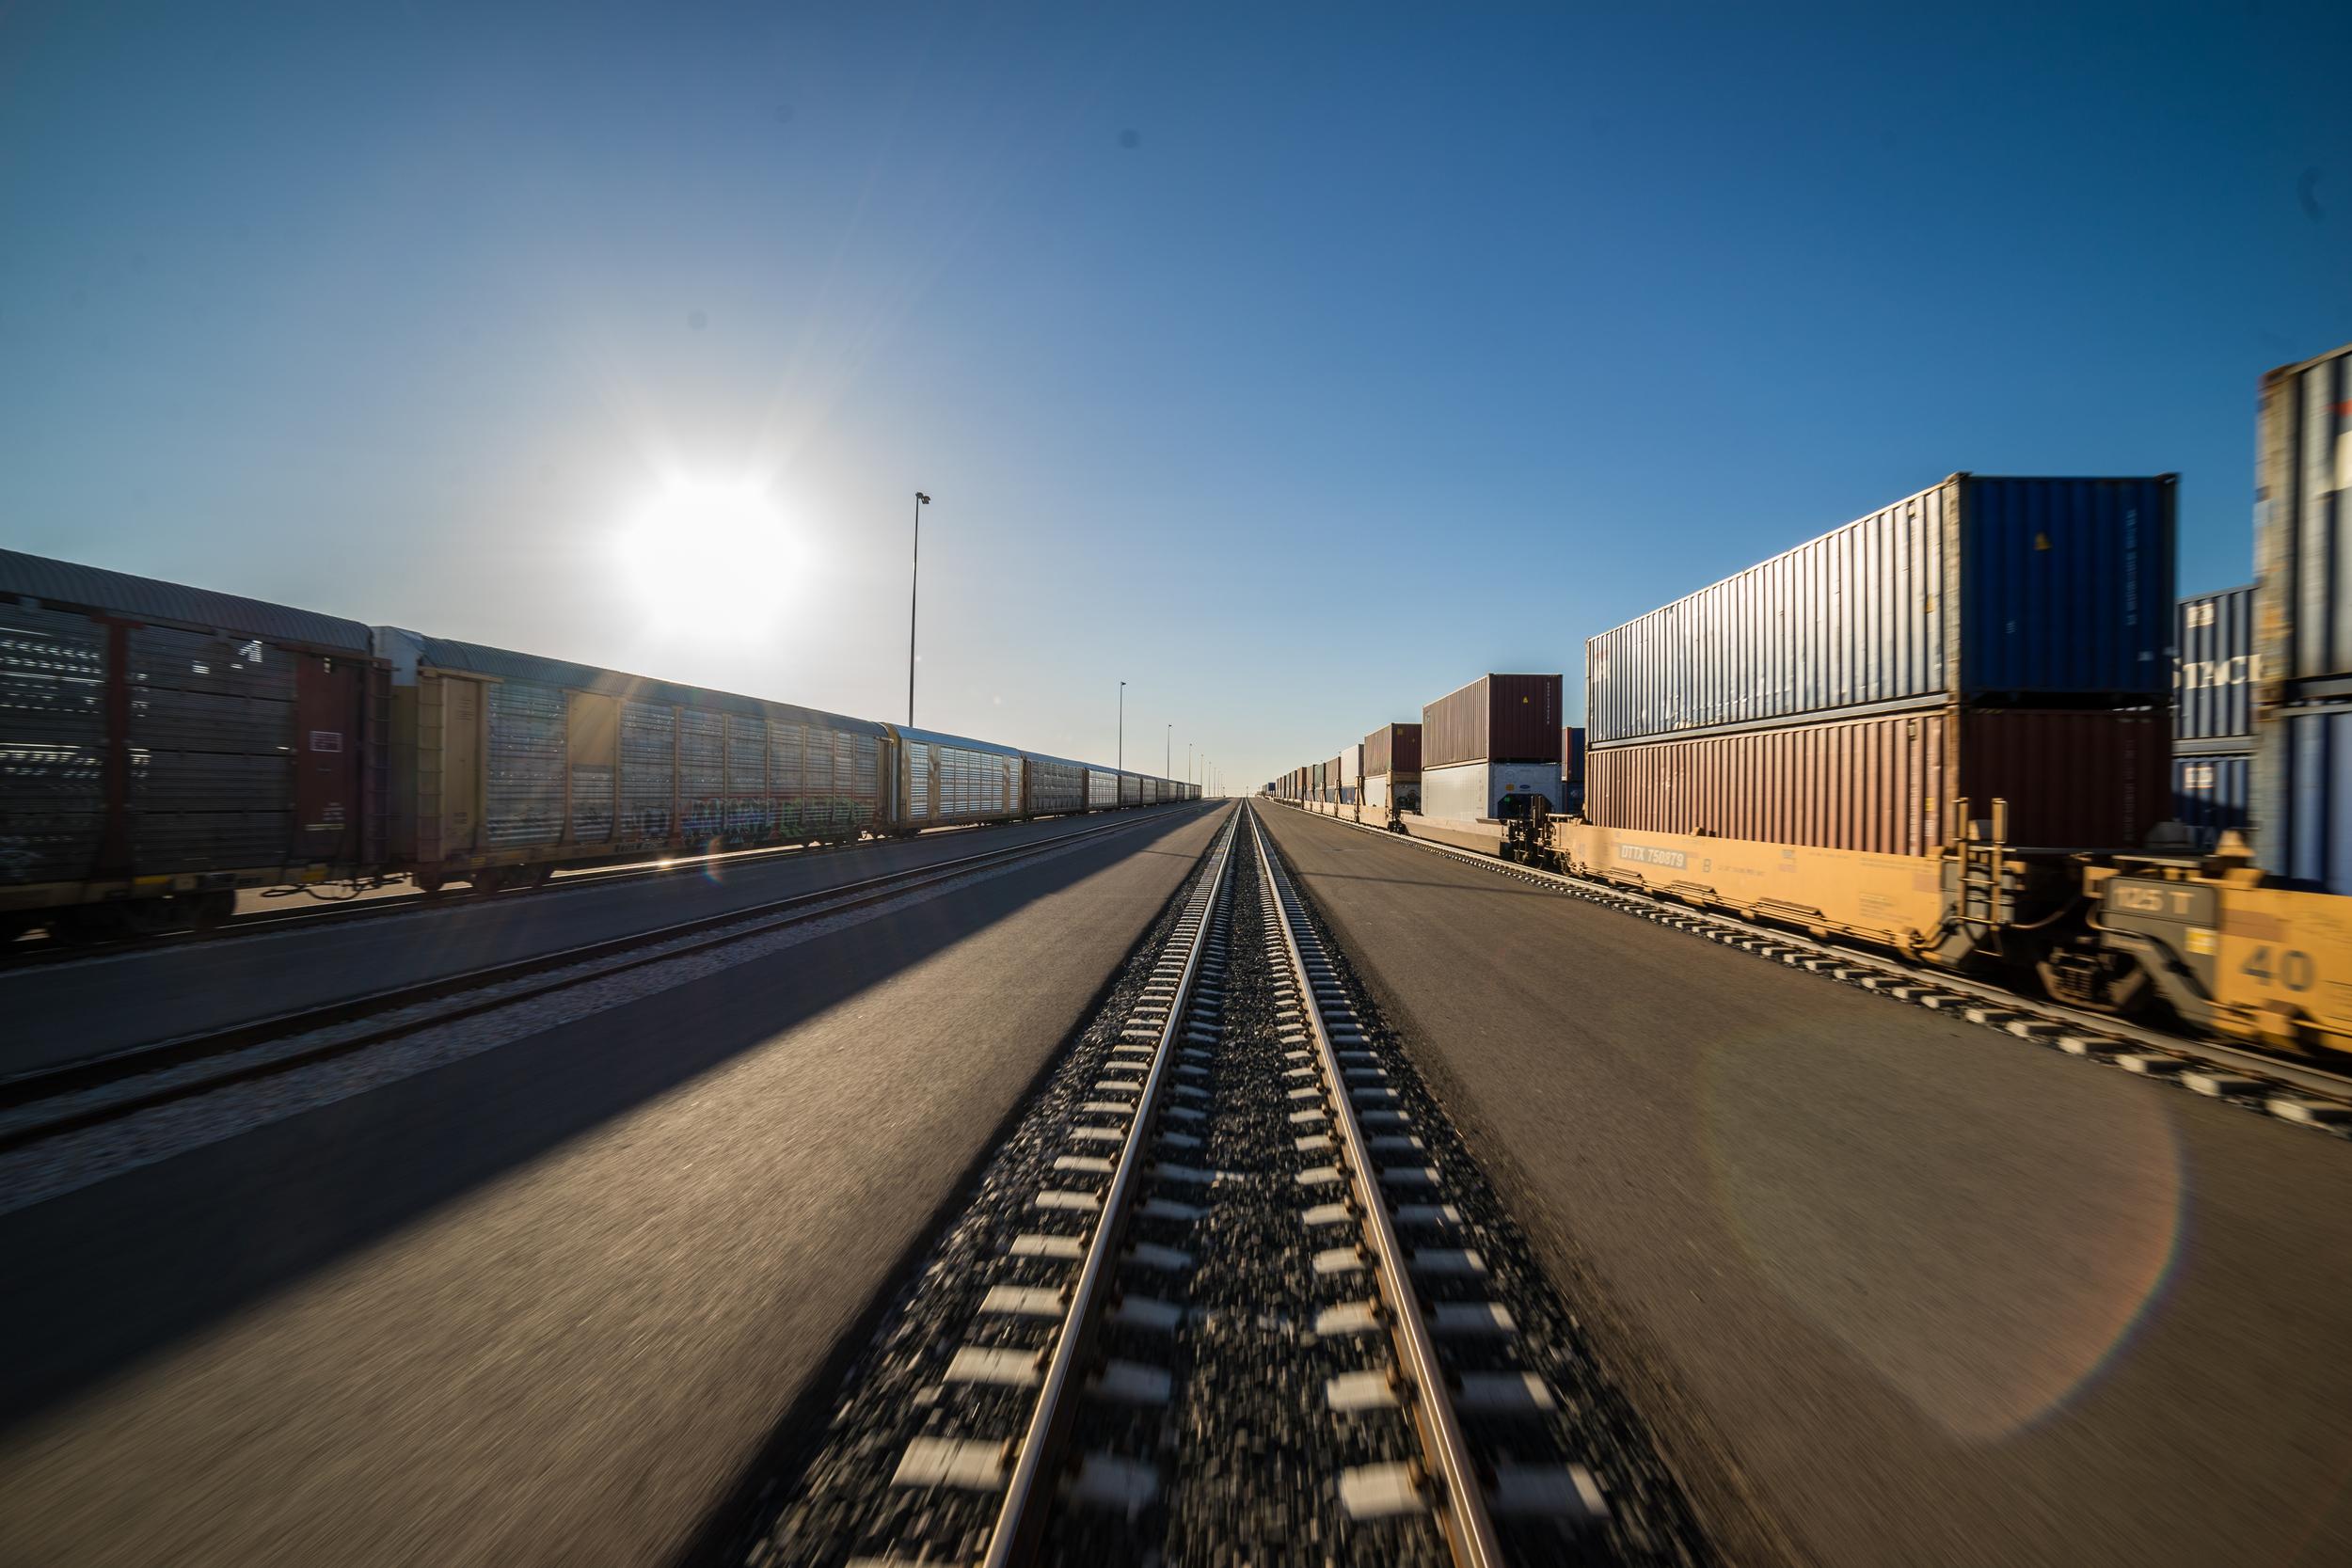 LATEST VIDEOS: CROSS COUNTRY TRAIN TRIP!